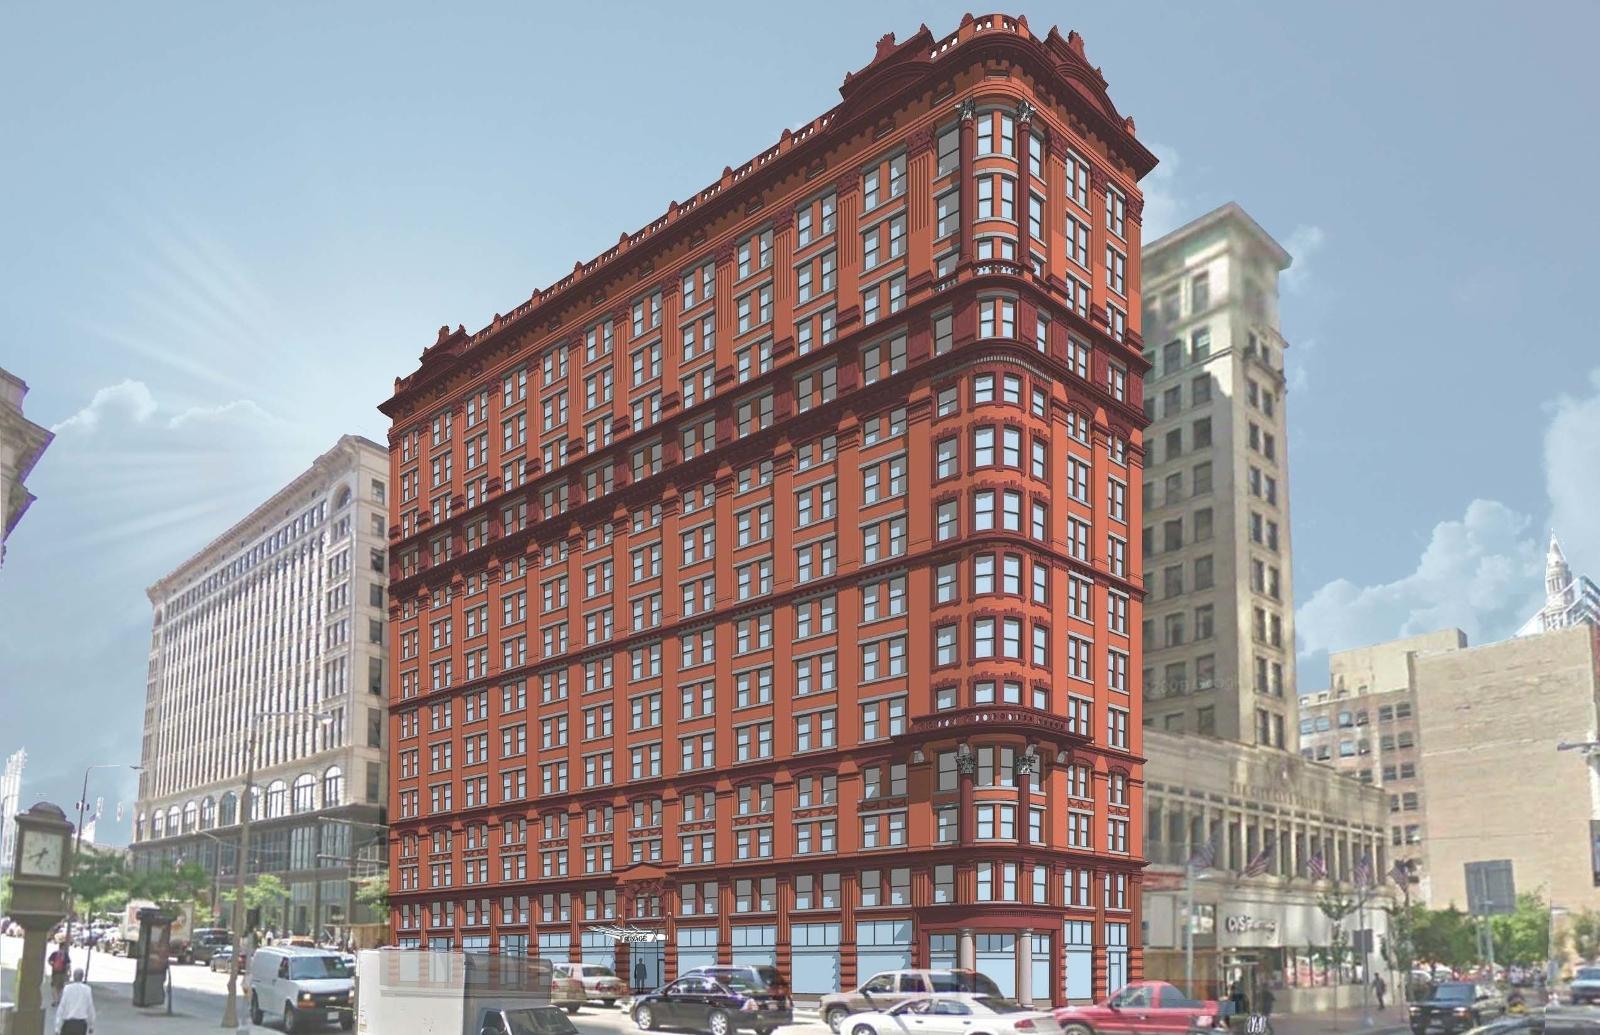 Ihg Unveils Three Iconic Hotel